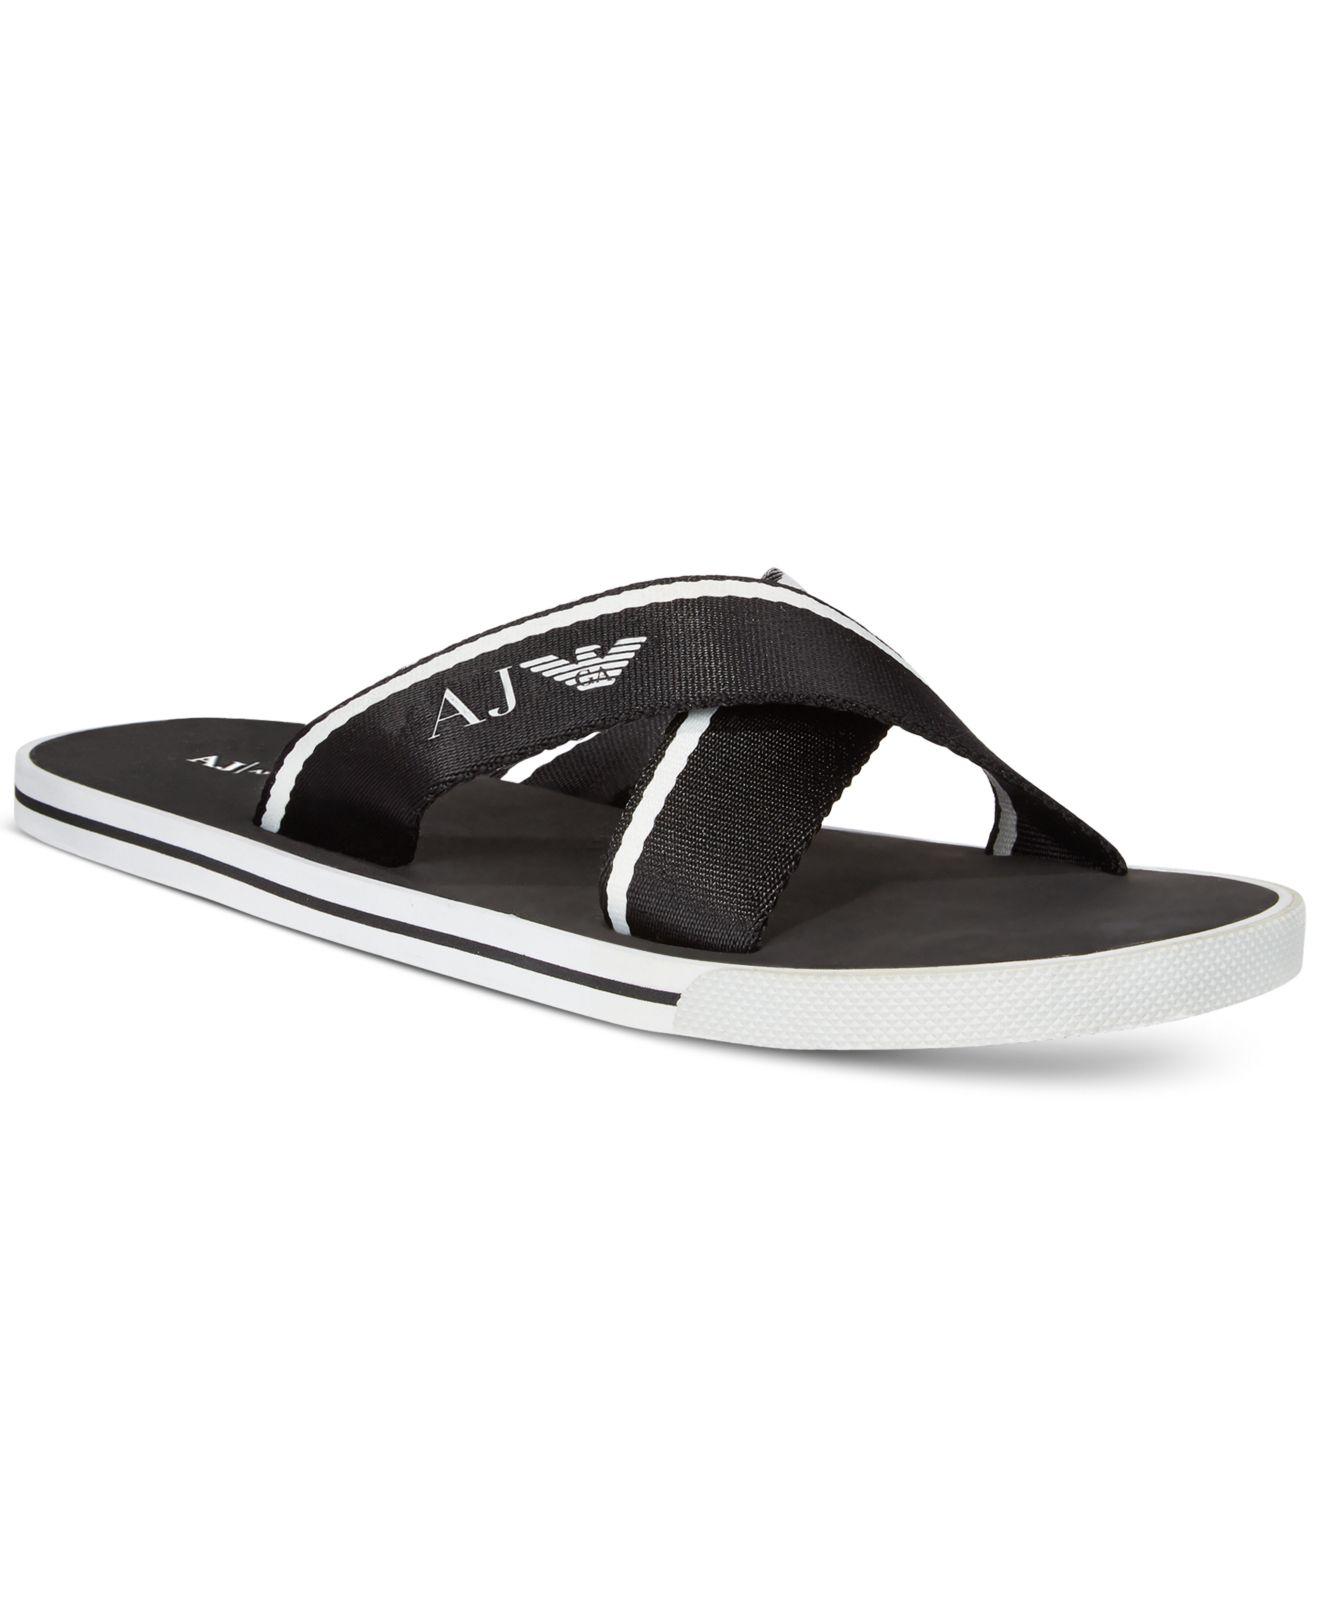 305694c97e55a Lyst - Armani Jeans Logo Slide Sandals in Black for Men